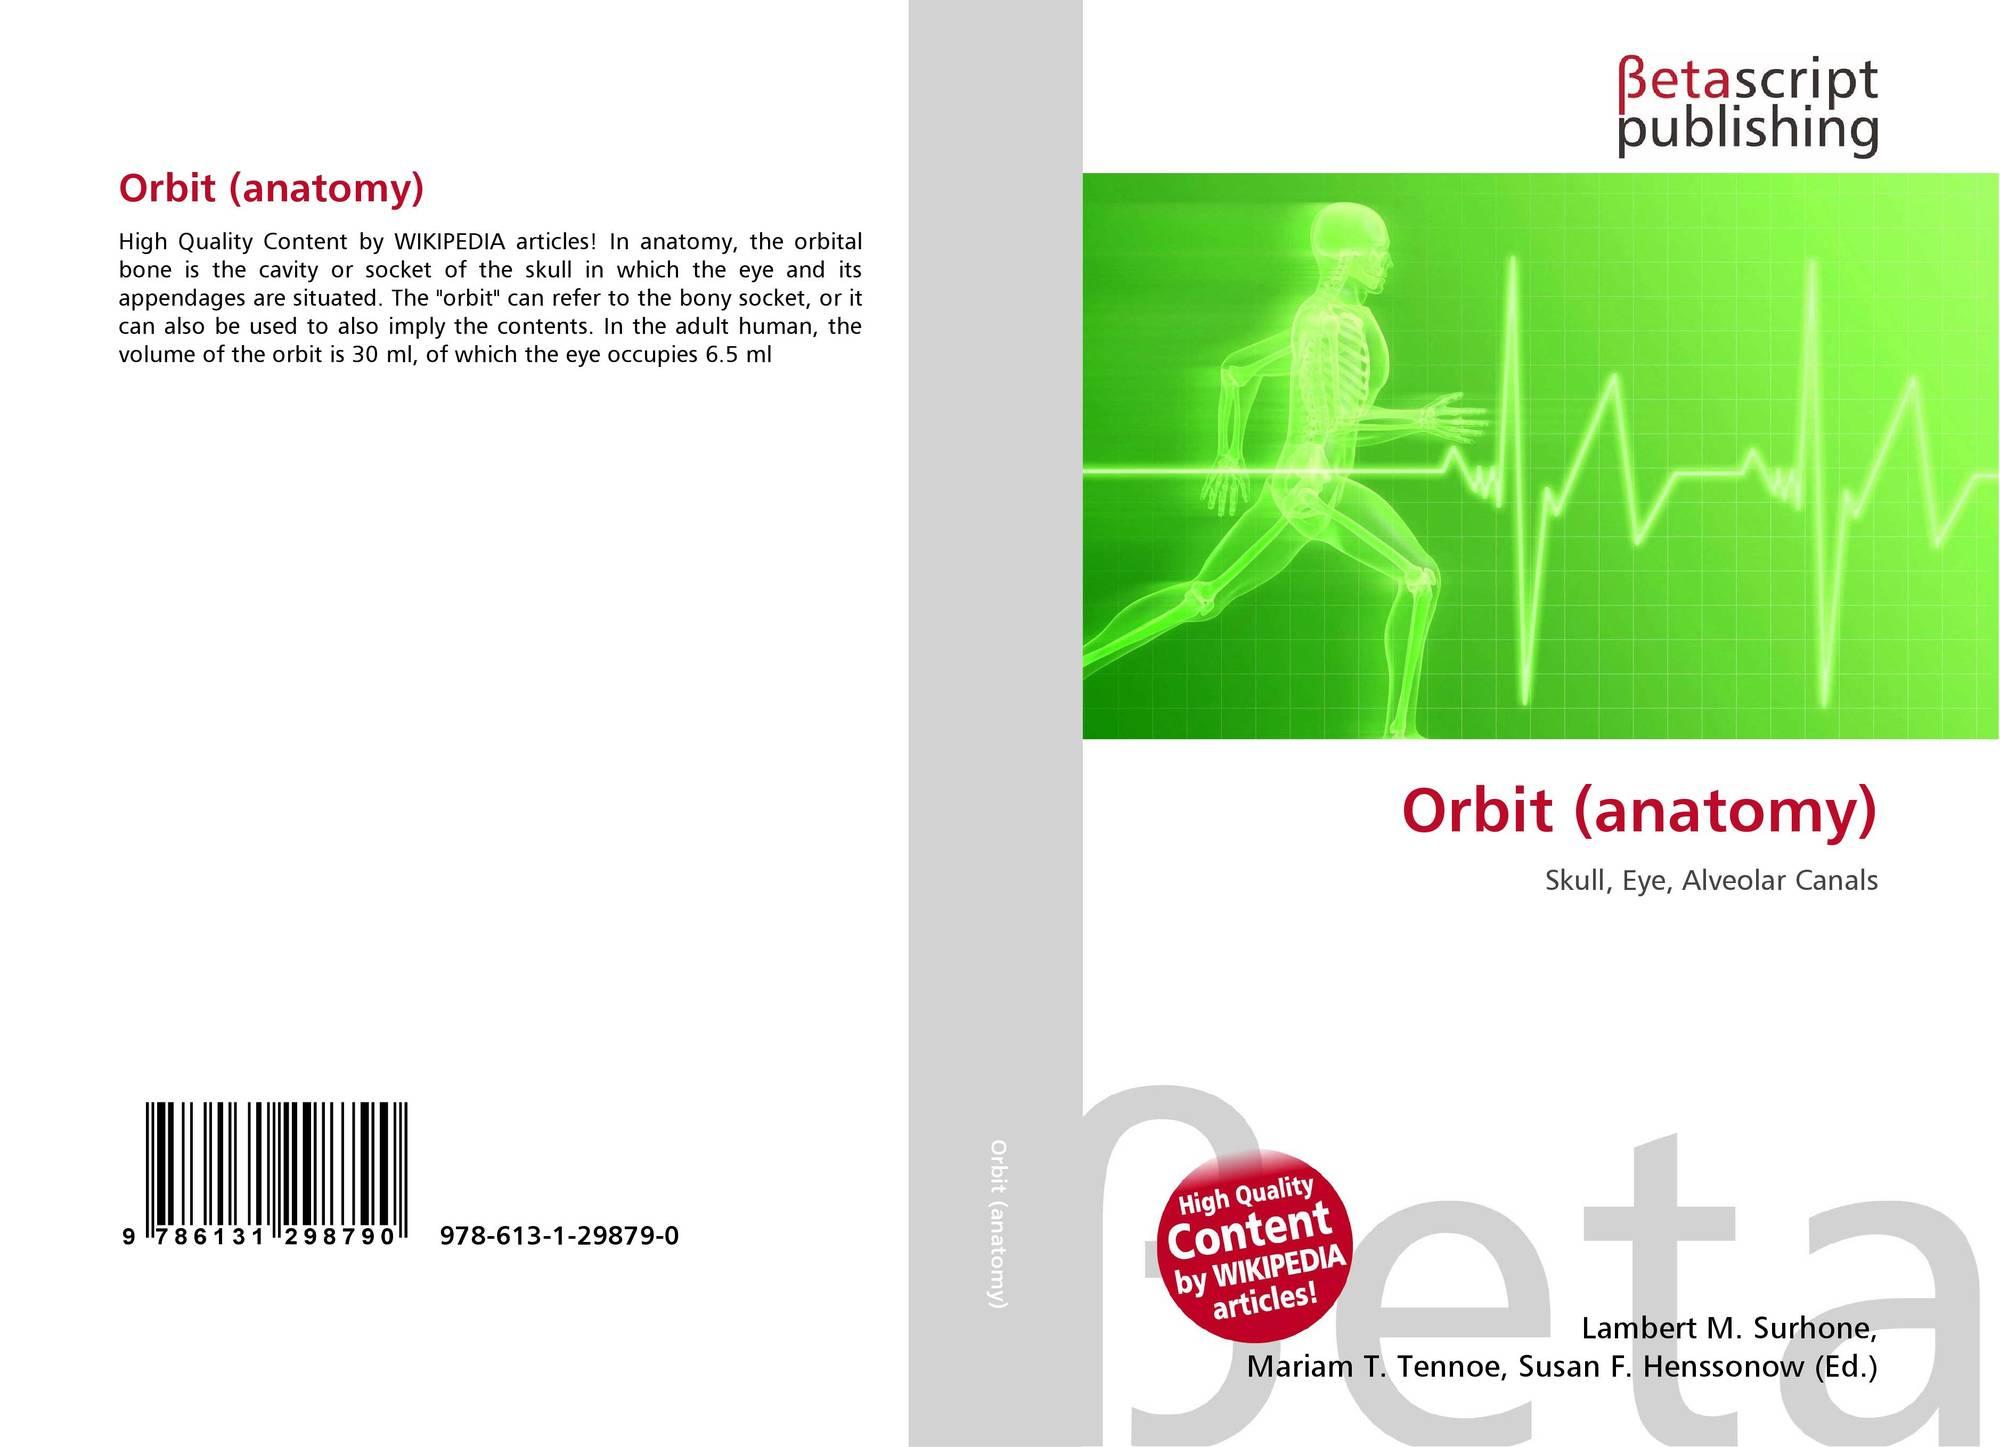 Orbit (anatomy), 978-613-1-29879-0, 6131298793 ,9786131298790